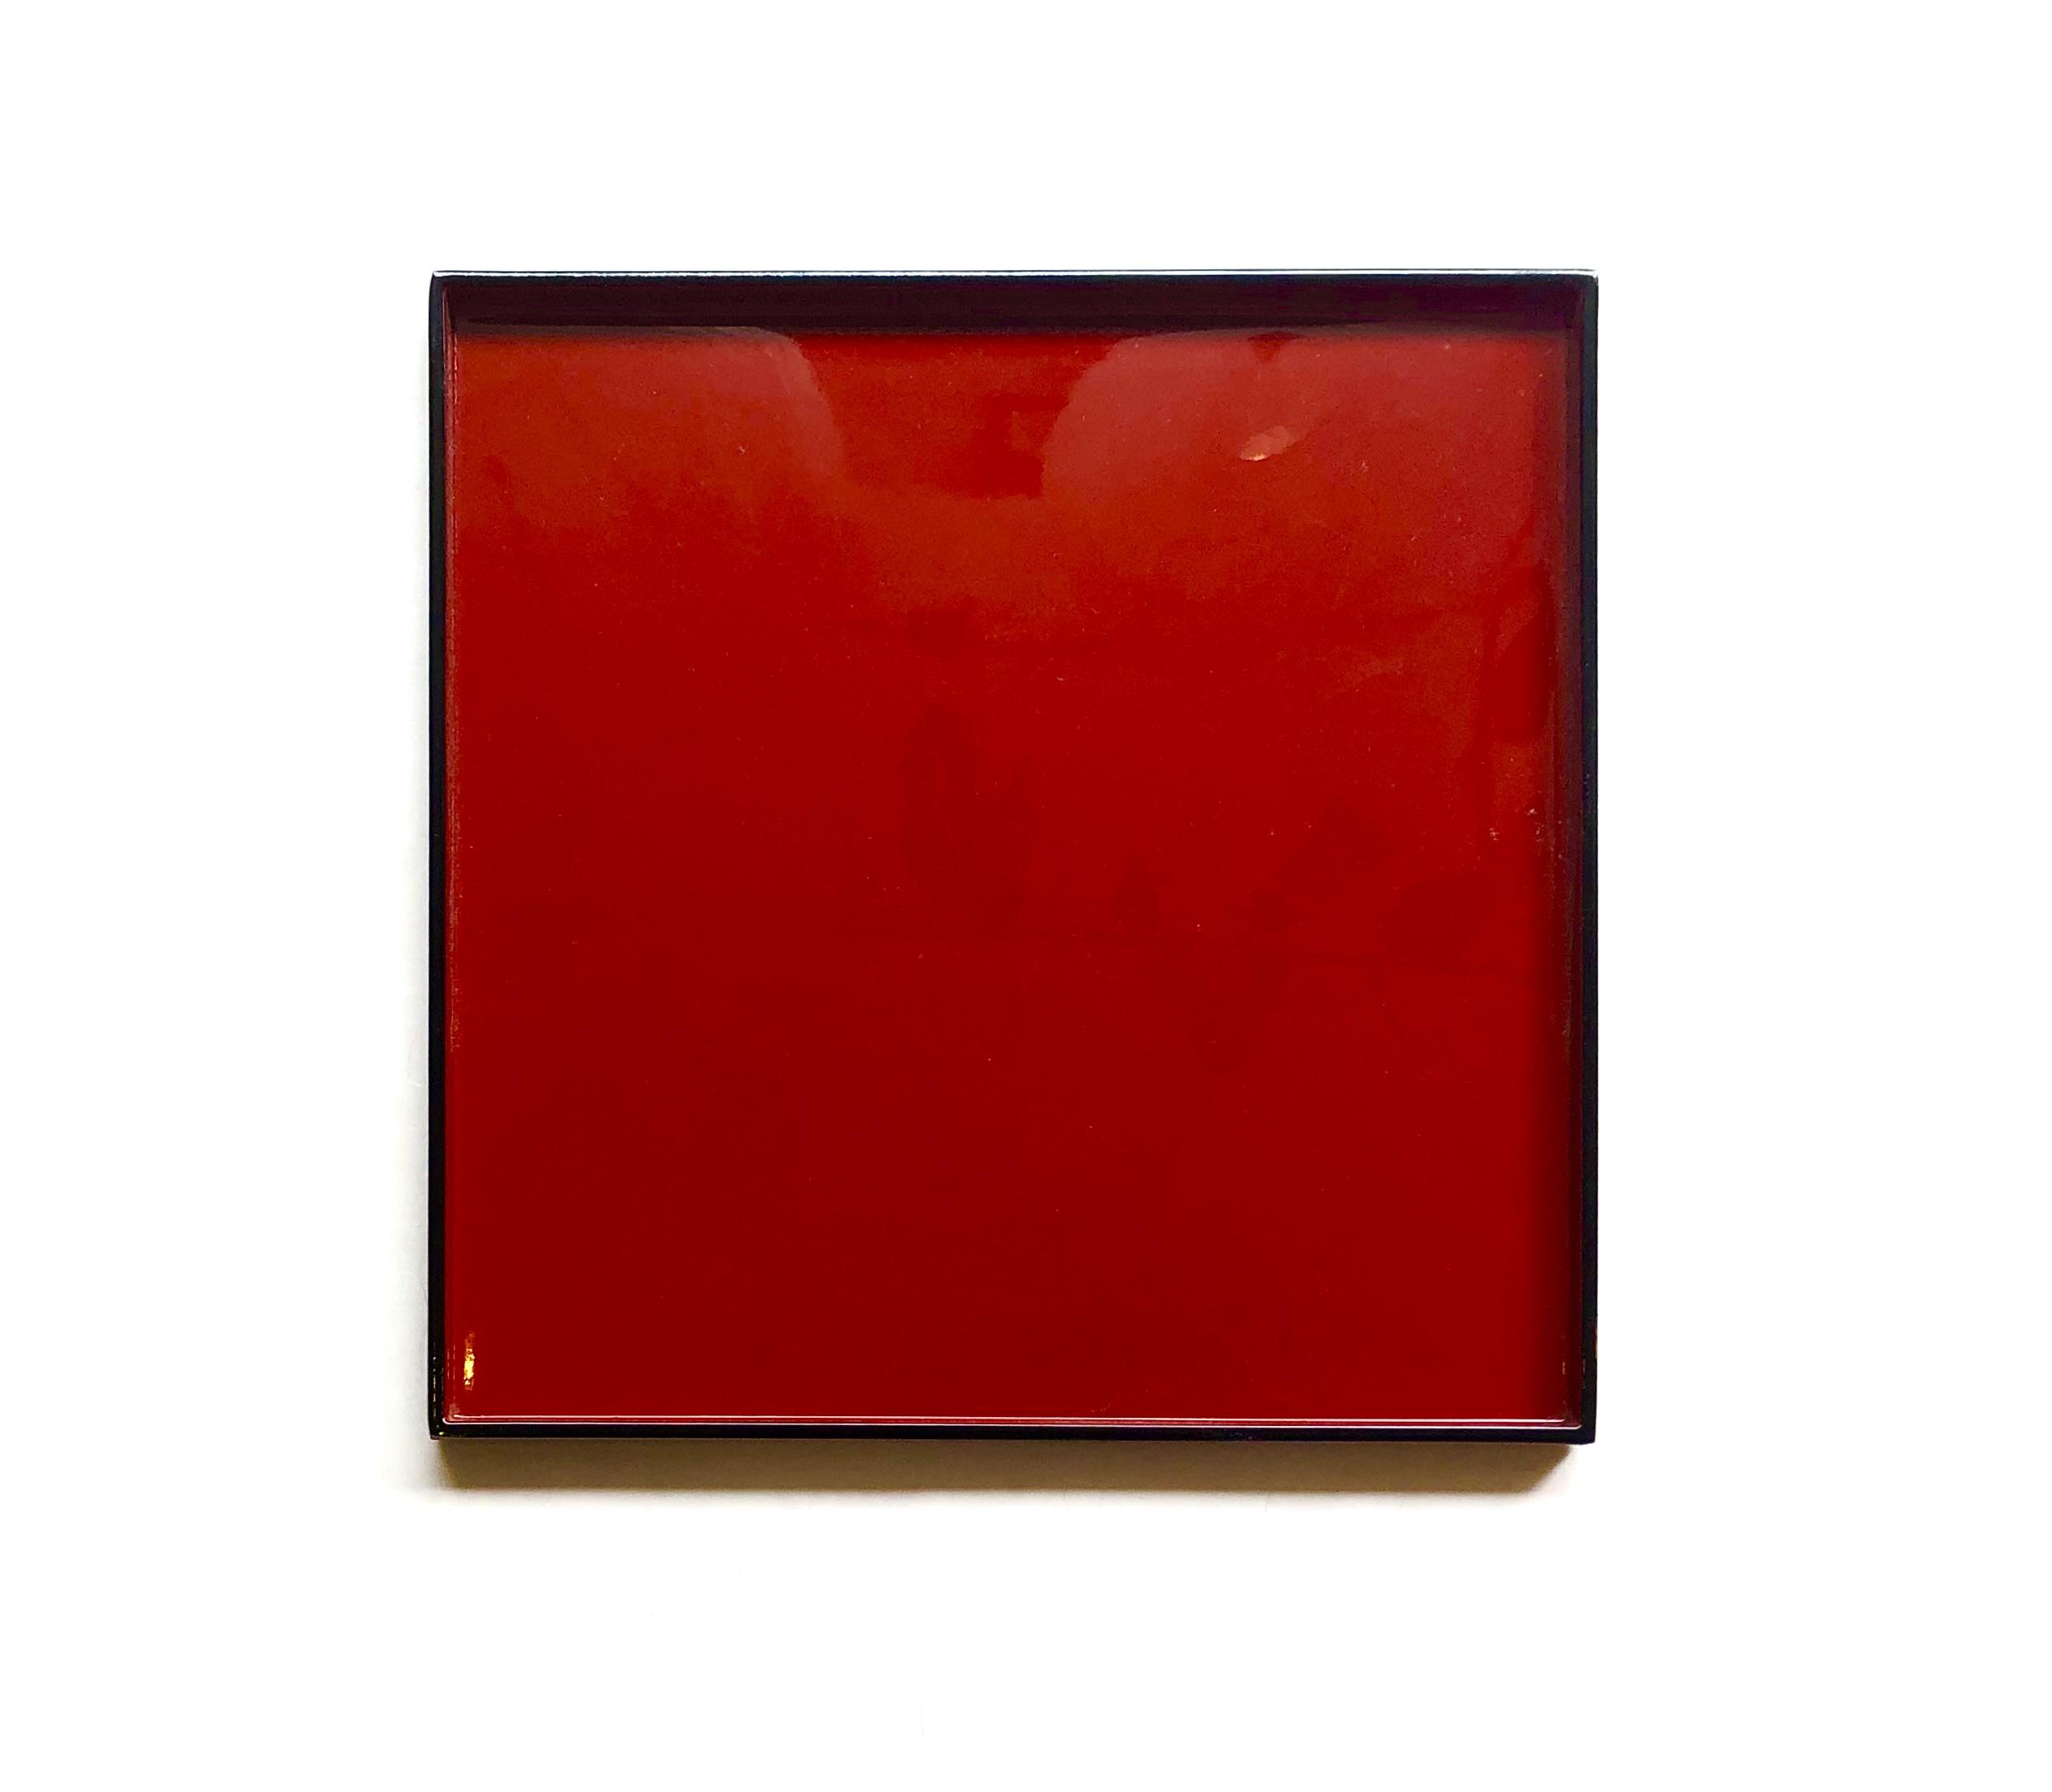 Lacktablett rot-schwarz 30 cm x 30 cm